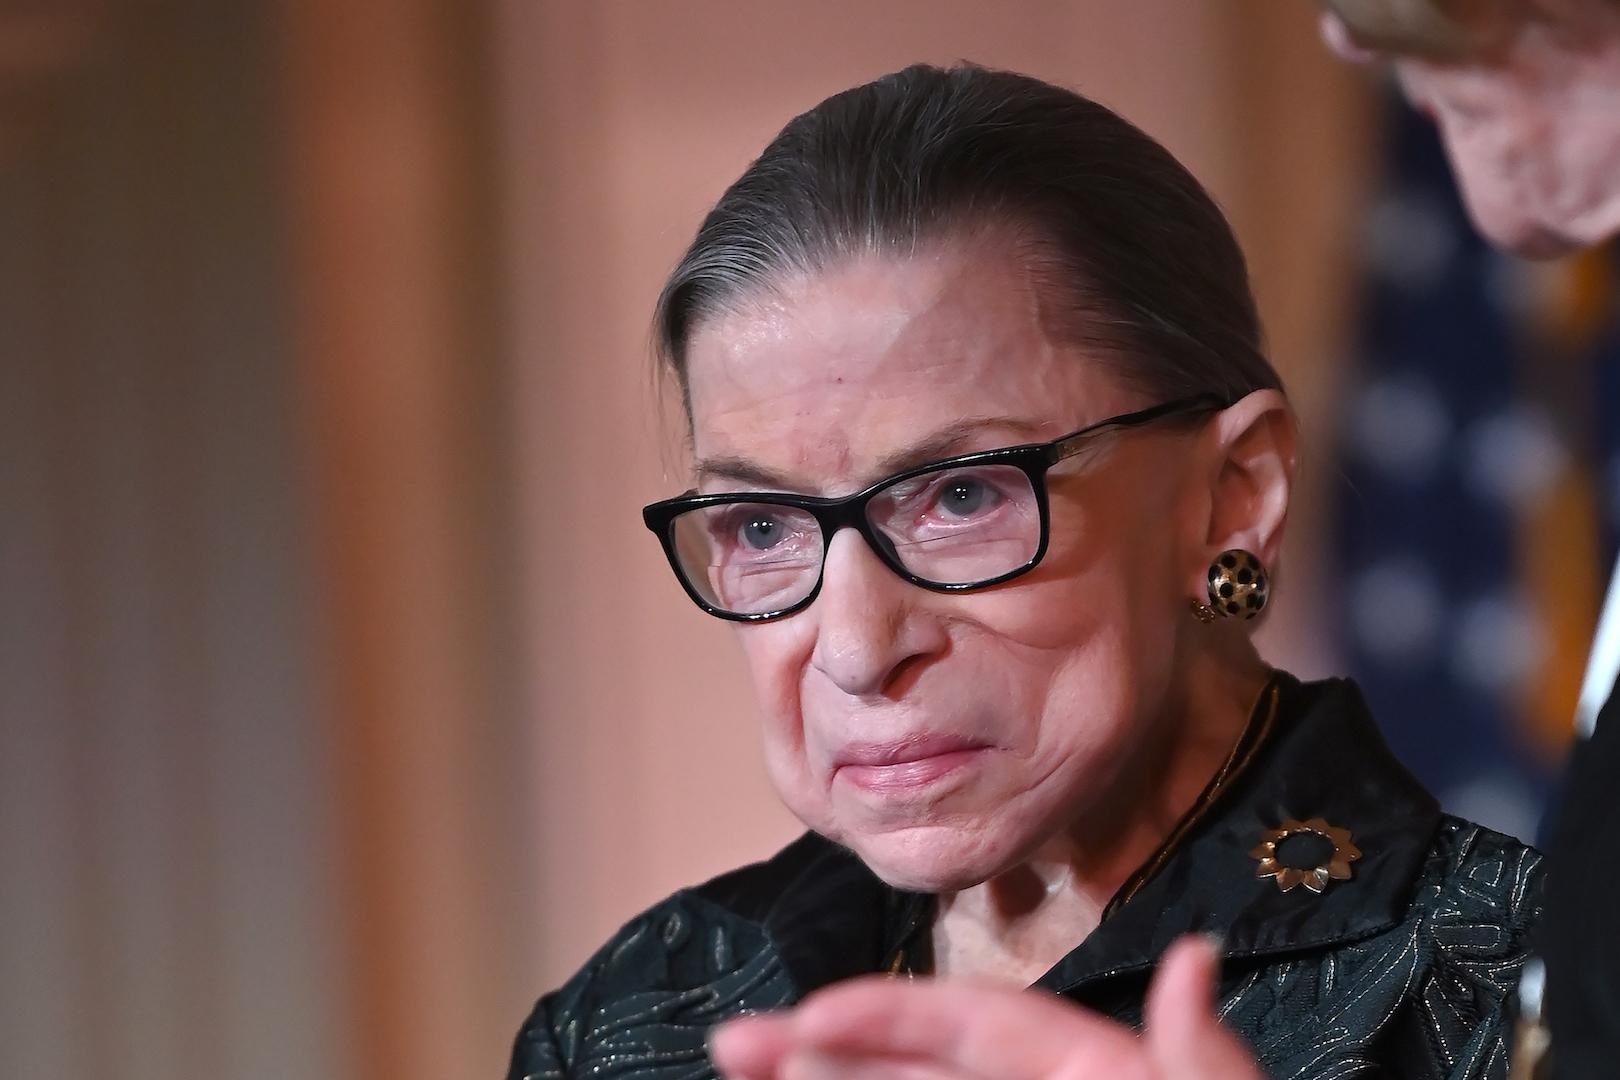 , Ruth Bader Ginsburg Has Died at Age 87, Saubio Making Wealth